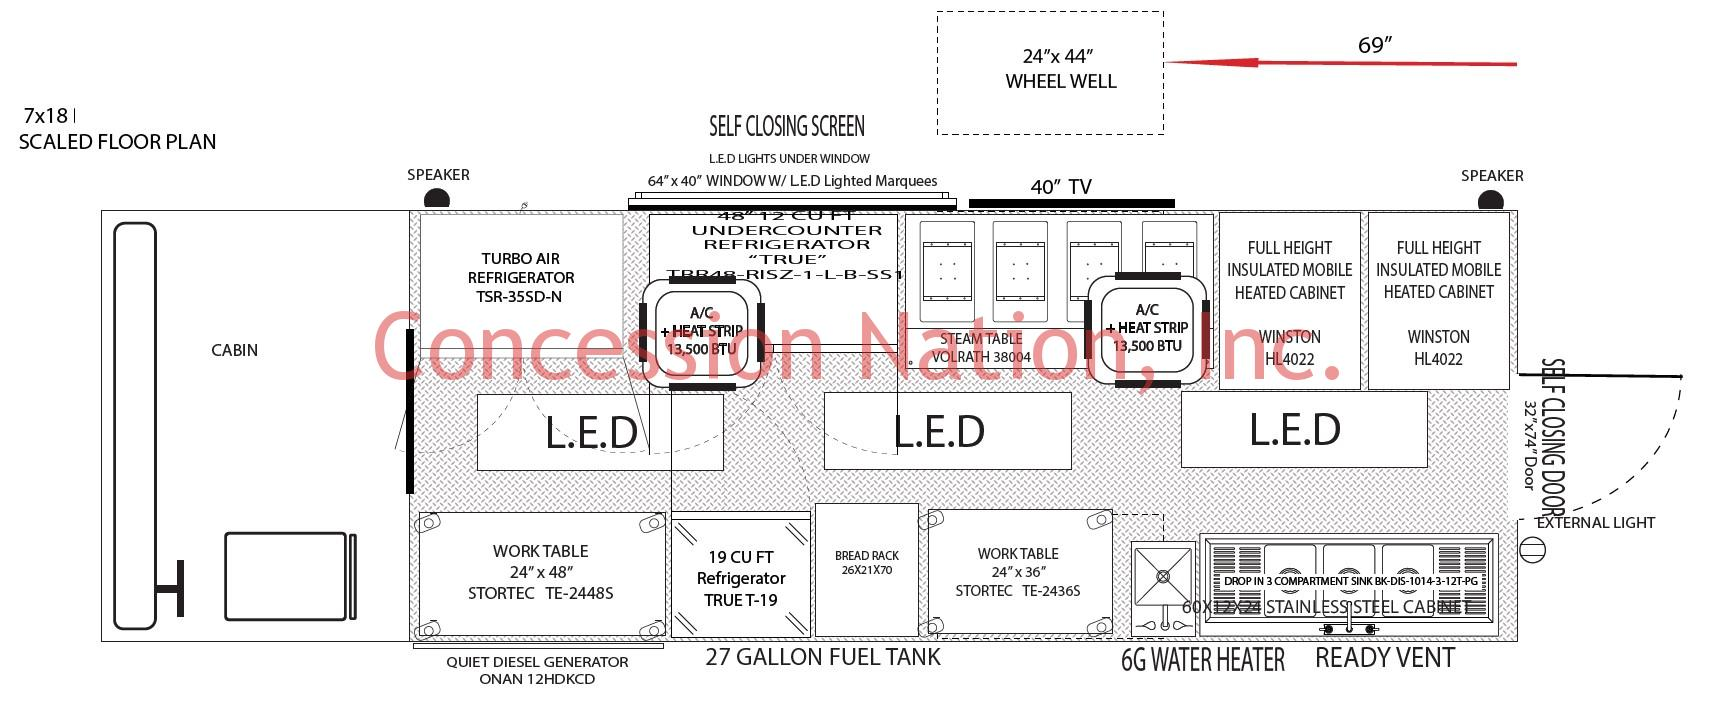 Go Bbq Mn 7x18 Floor Plan Food Trucks Concession Nation Food Trailers